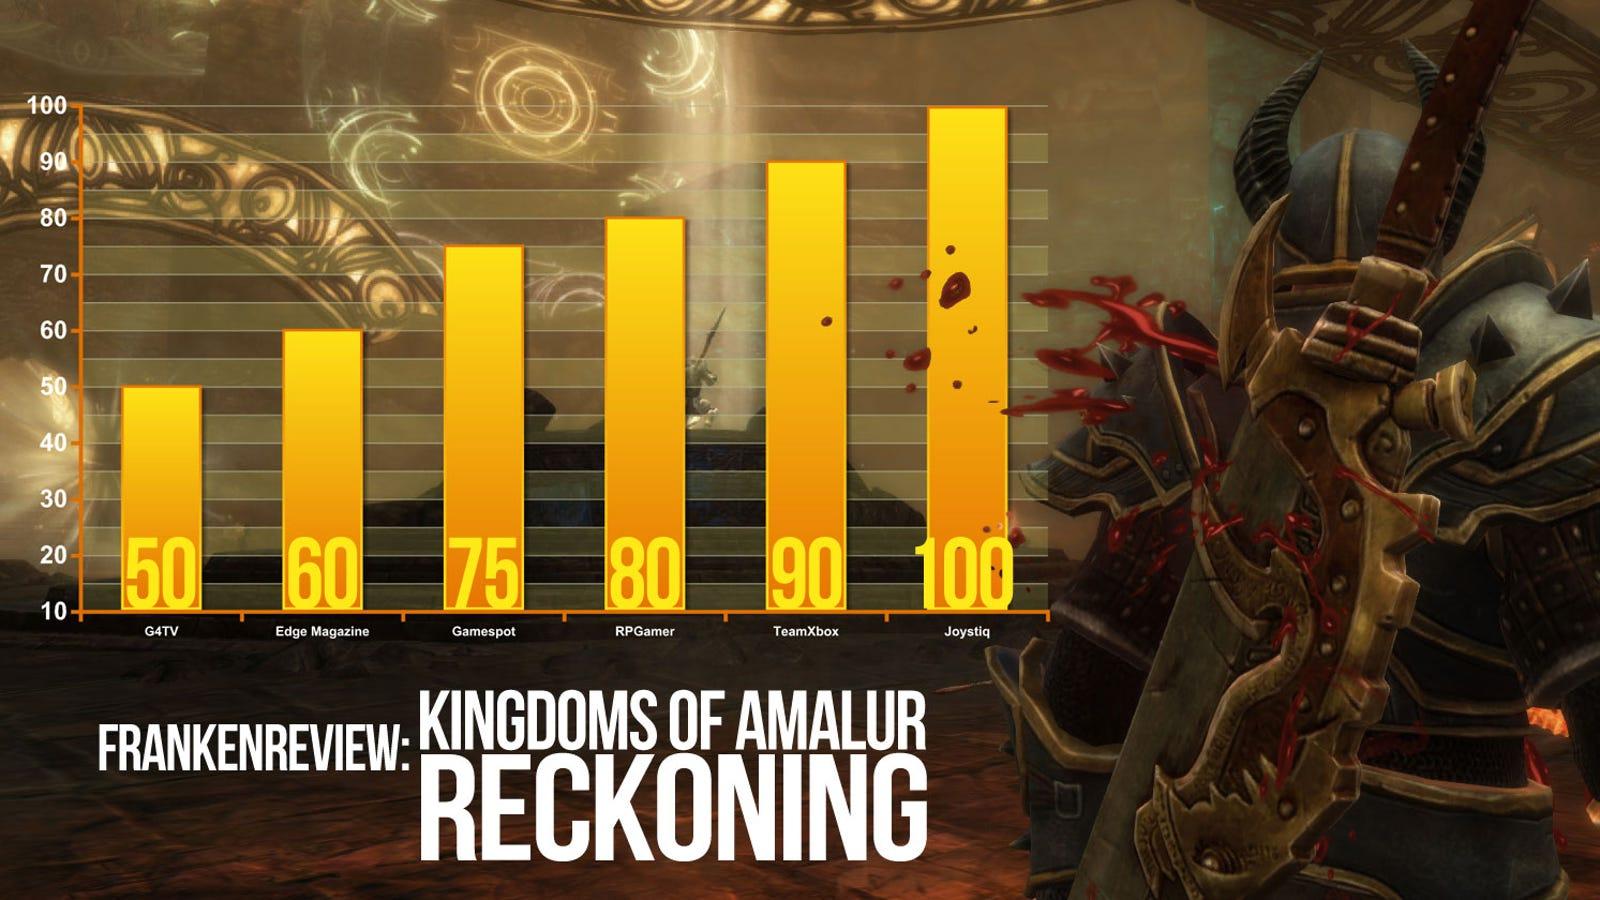 Kingdoms of Amalur: Reckoning Leveled Up Considerably During